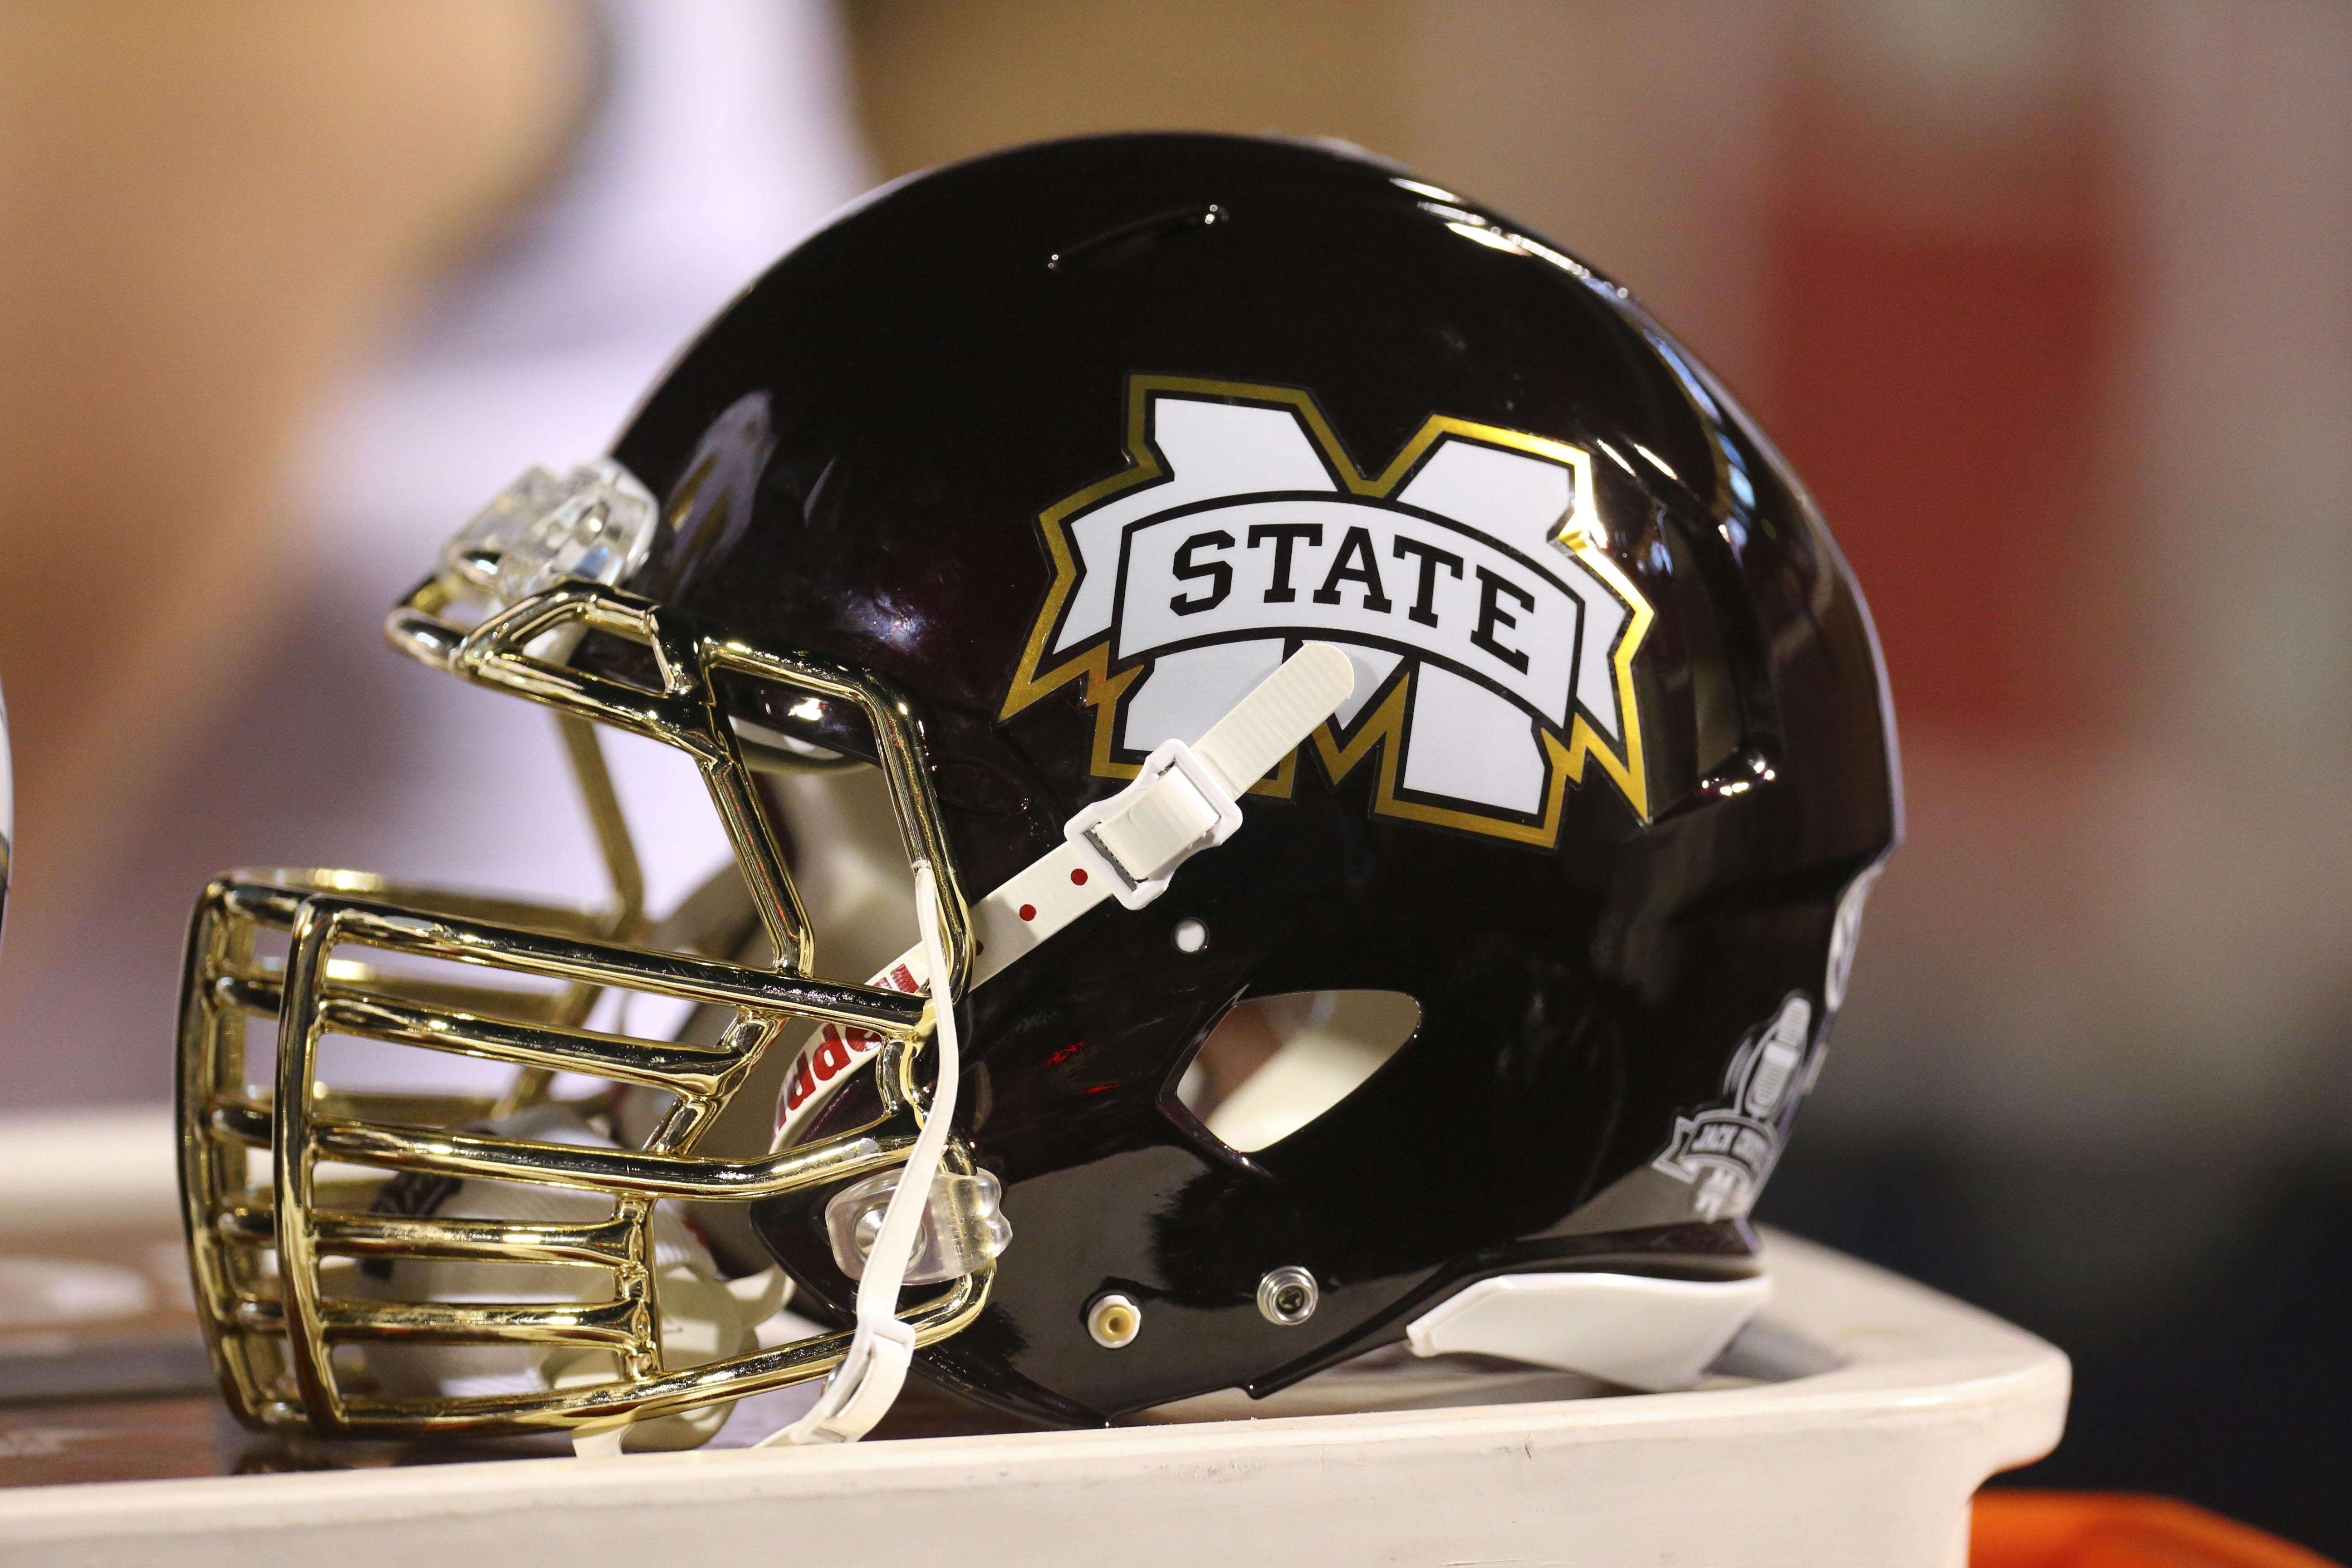 99bc8750b9ddf 2015 Capital One Orange Bowl  Mississippi State Bulldogs vs. Georgia ...